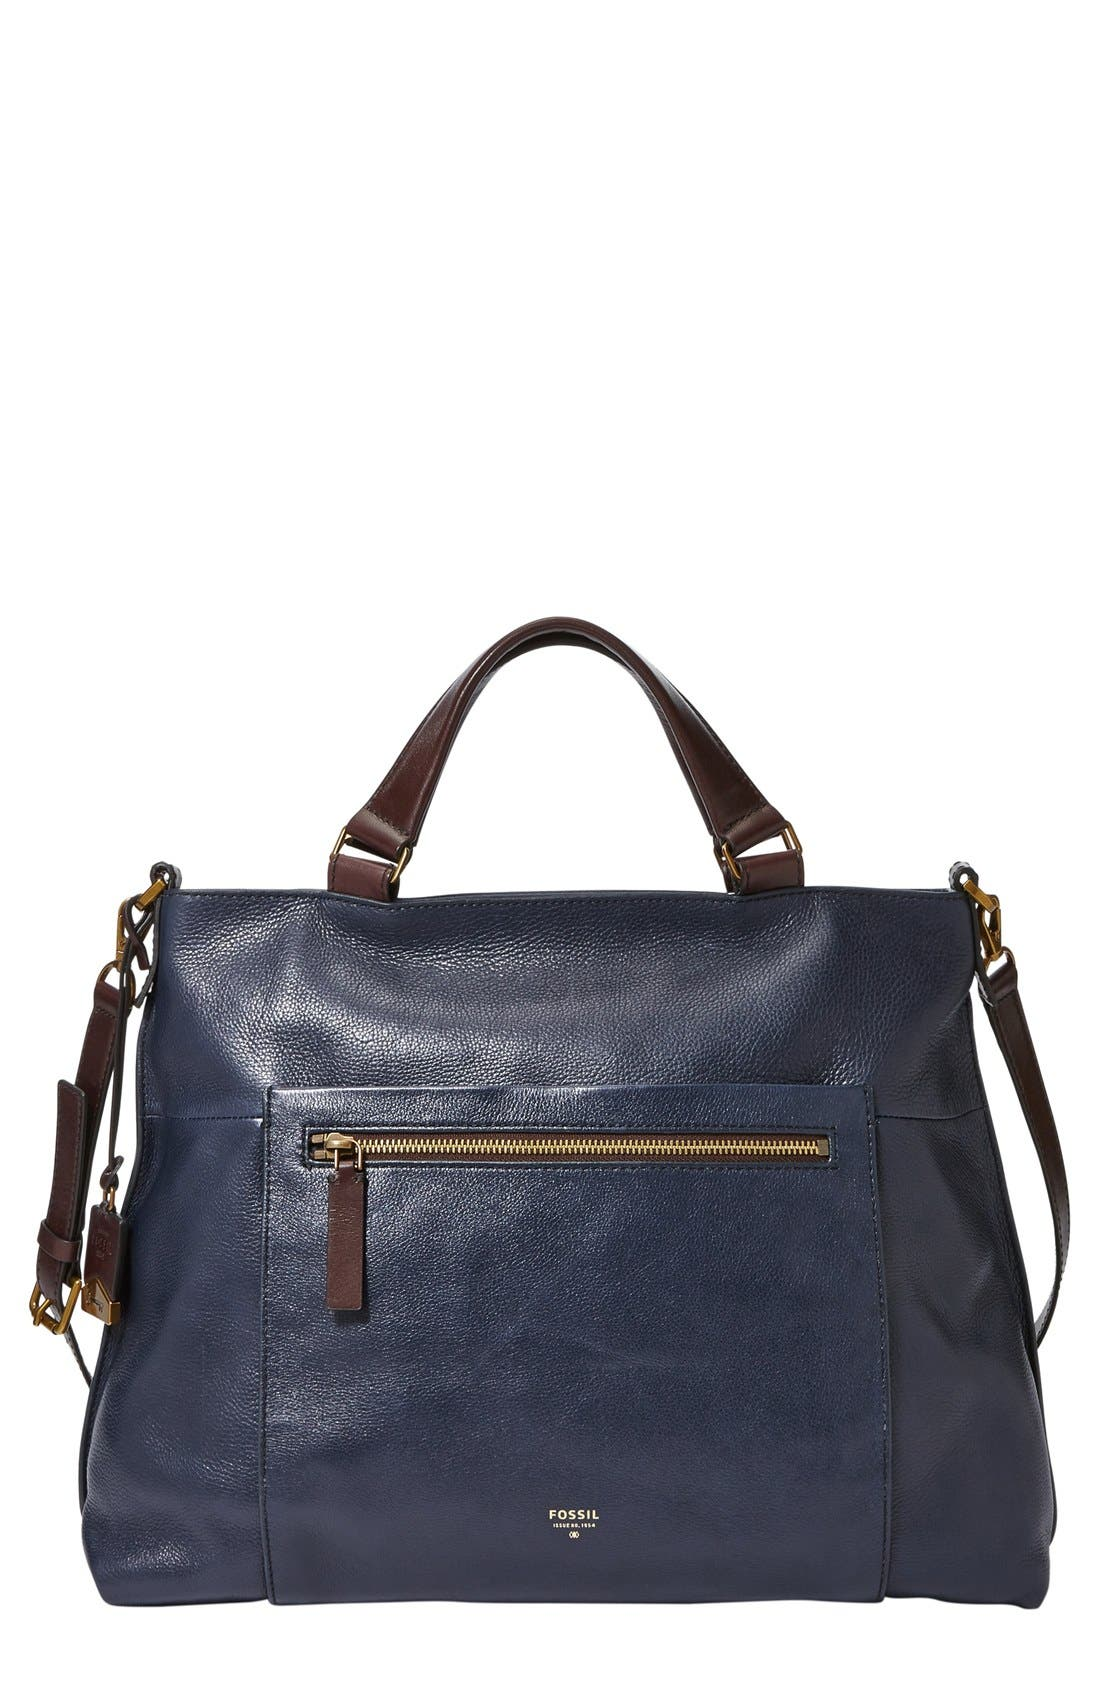 Main Image - Fossil 'Vickery' Leather Crossbody Bag